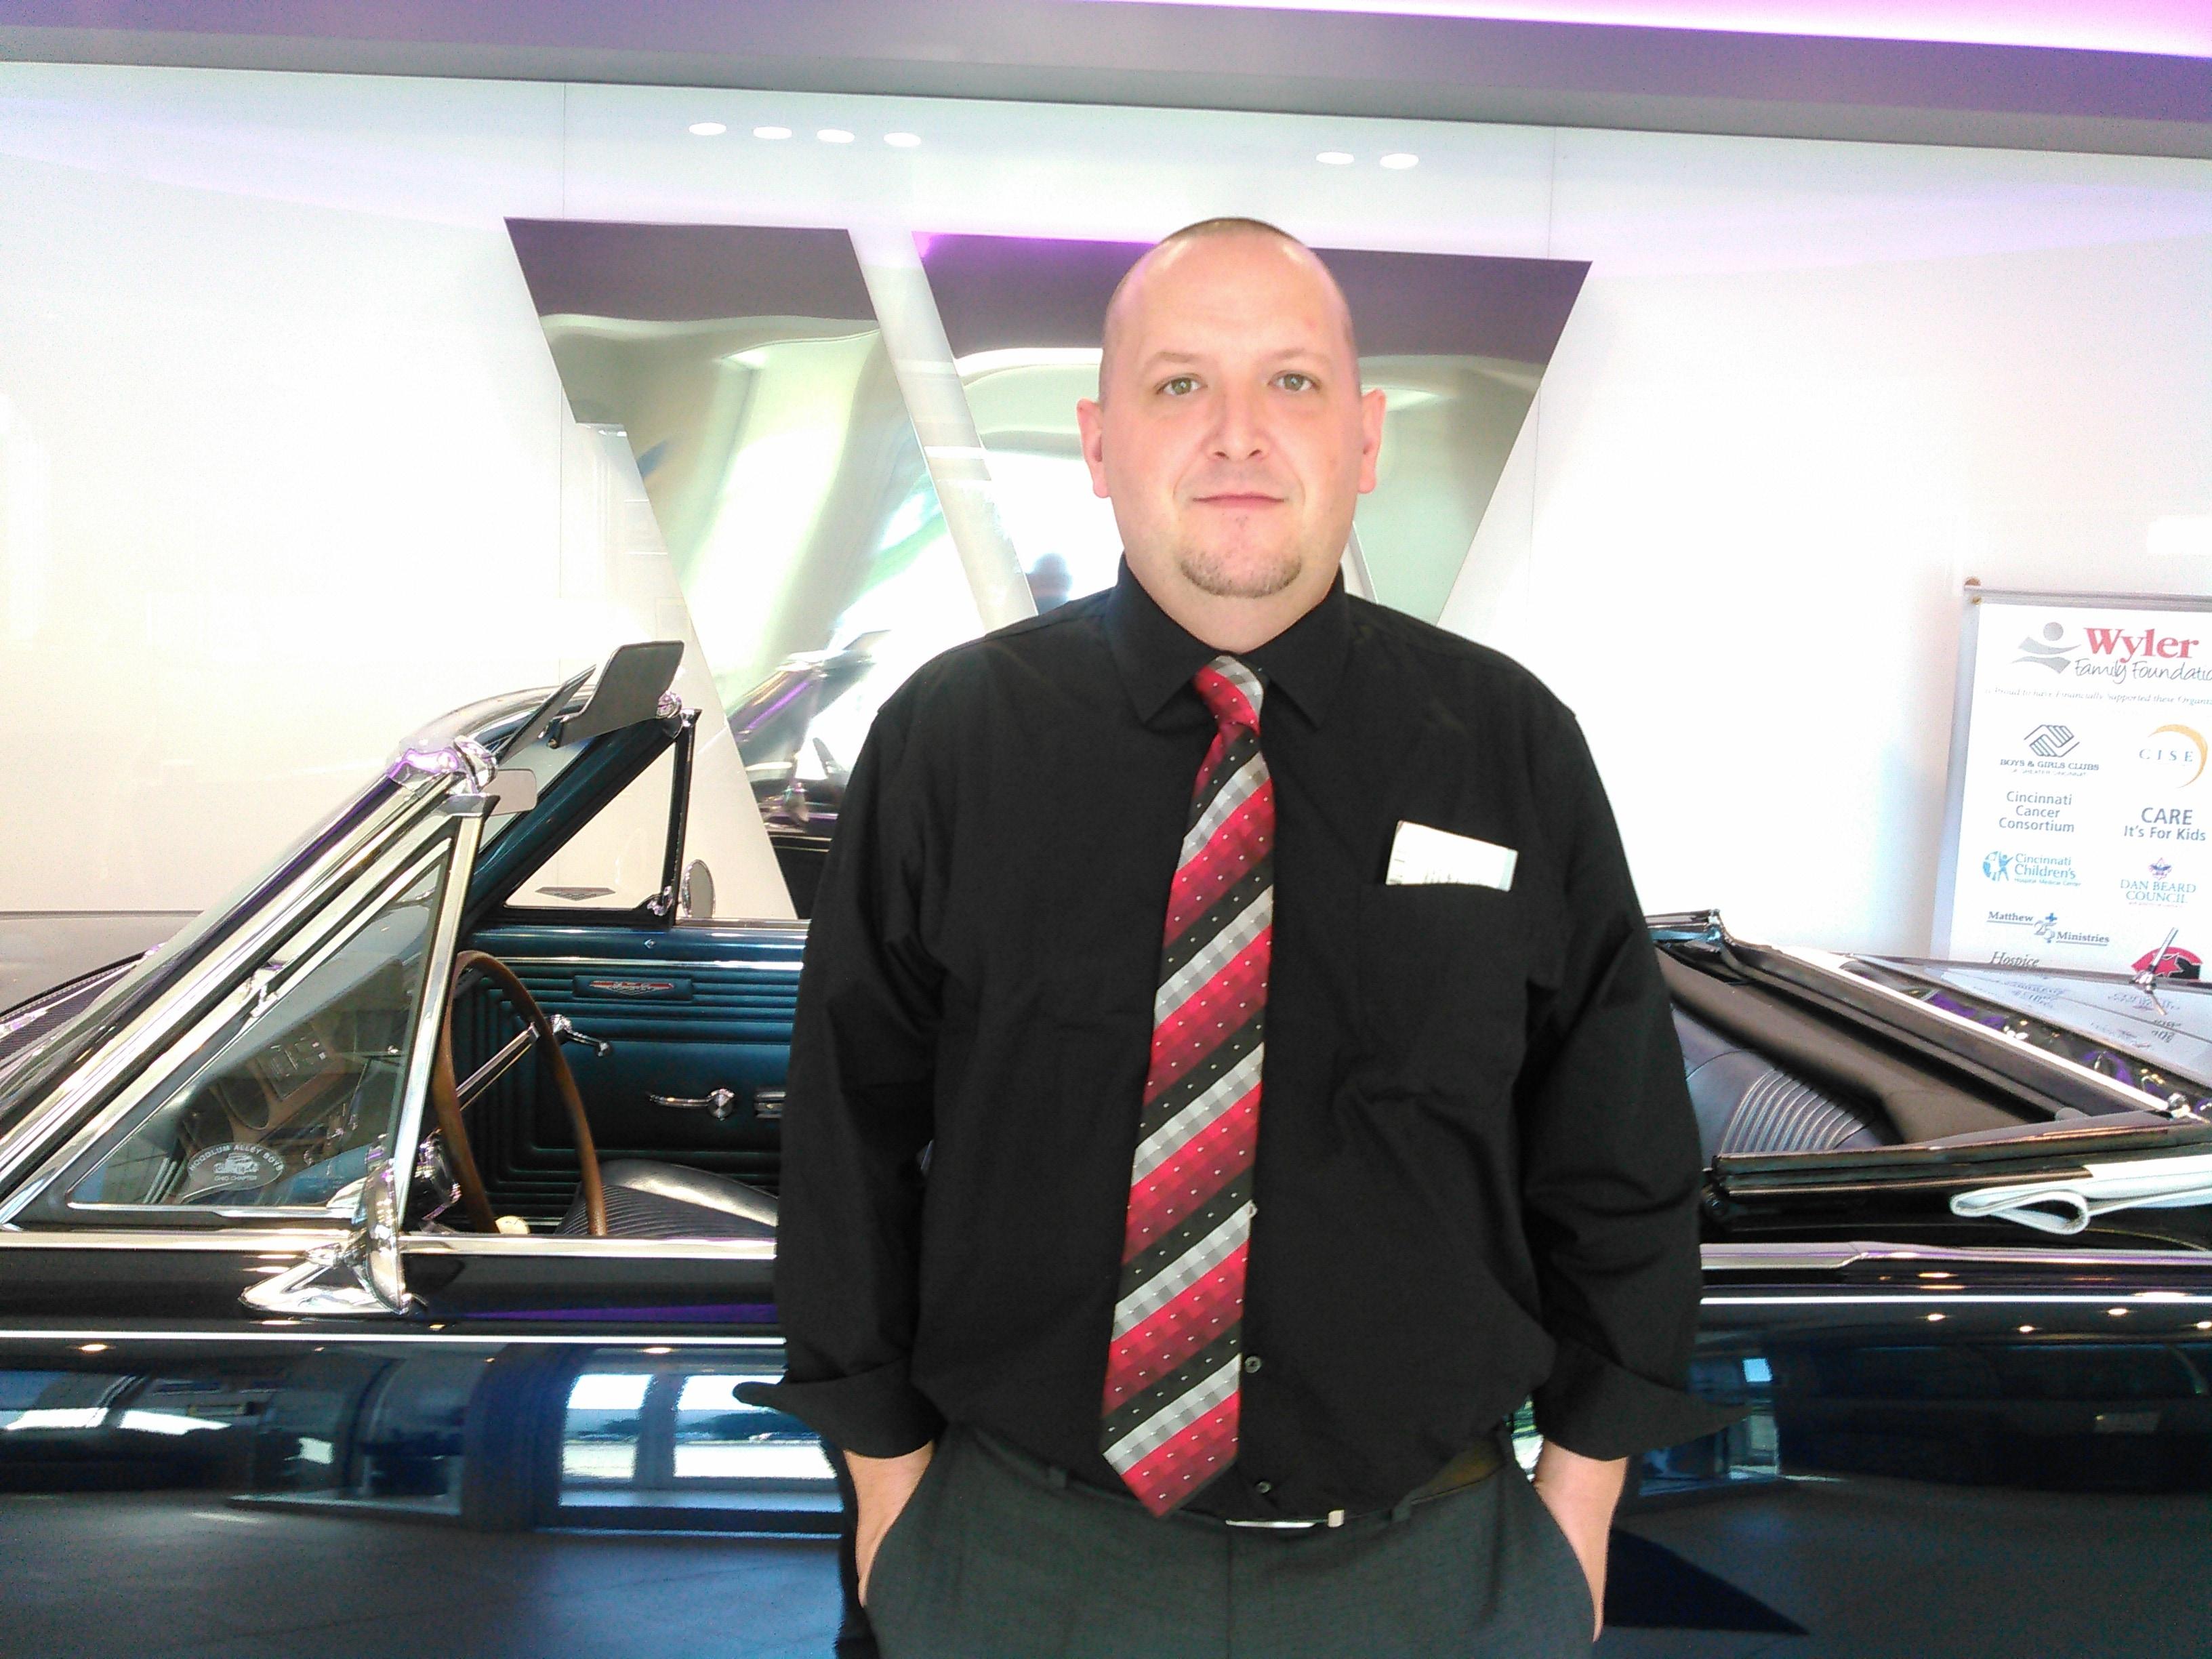 Jeff Wyler Dodge >> Meet the Staff | Jeff Wyler Chrysler Jeep Dodge Truck-Ft Thomas Dealership | Ft Thomas